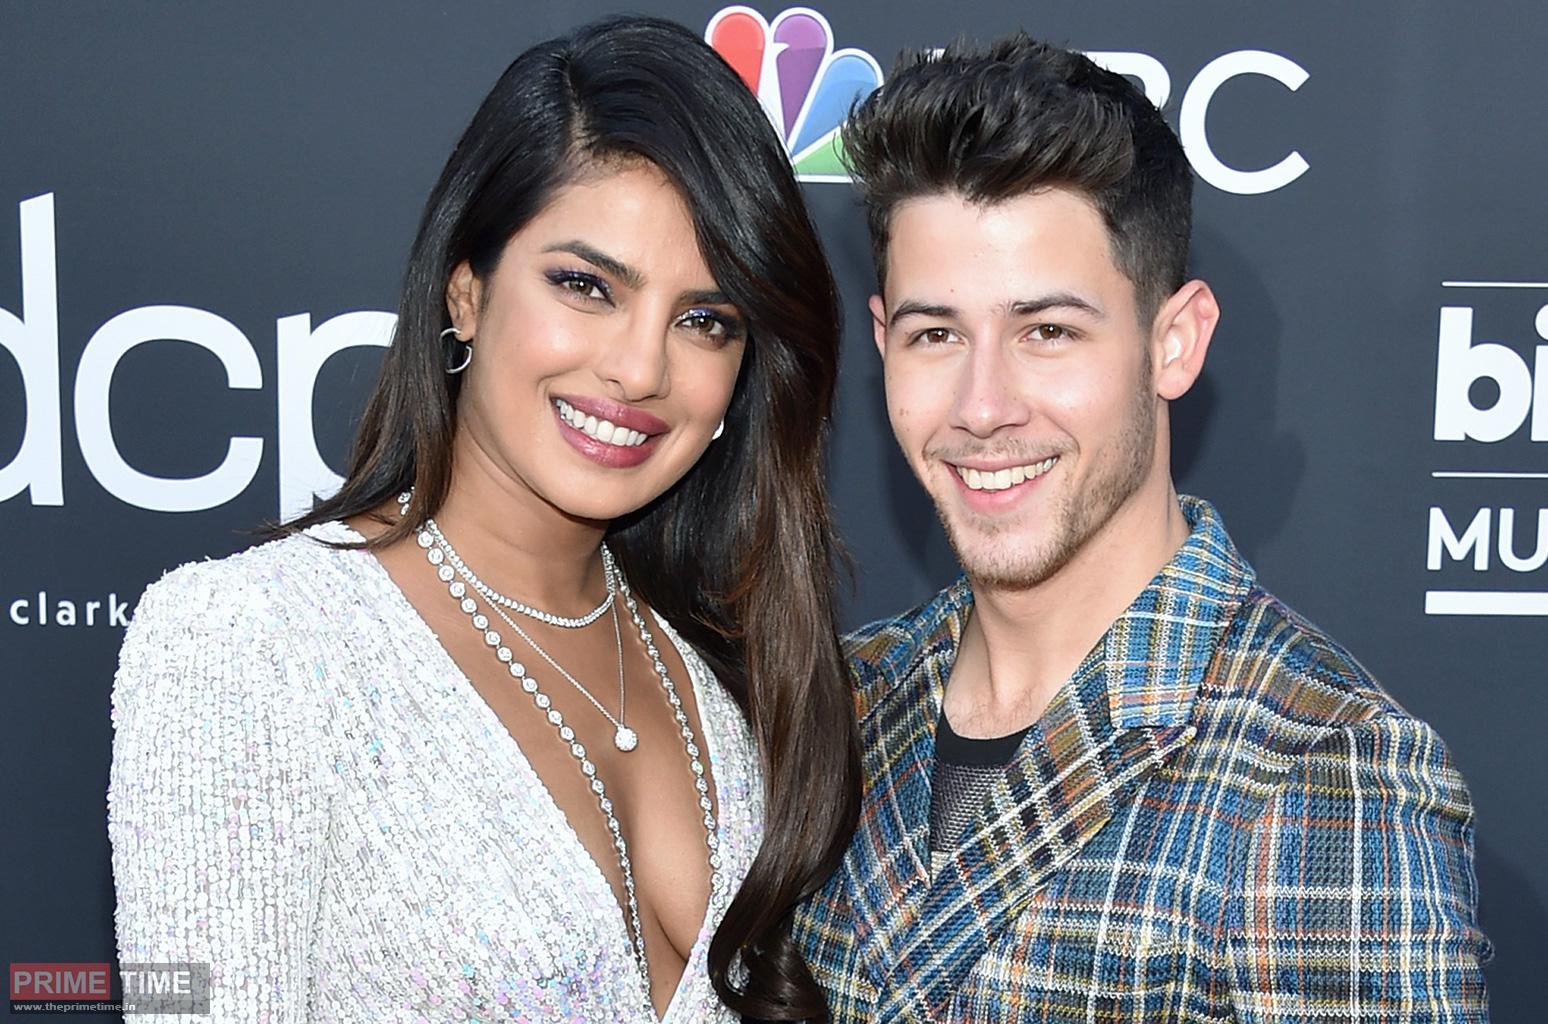 Priyanka Chopra, husband Nick Jonas congratulate on upcoming Amazon Studios' Citadel series